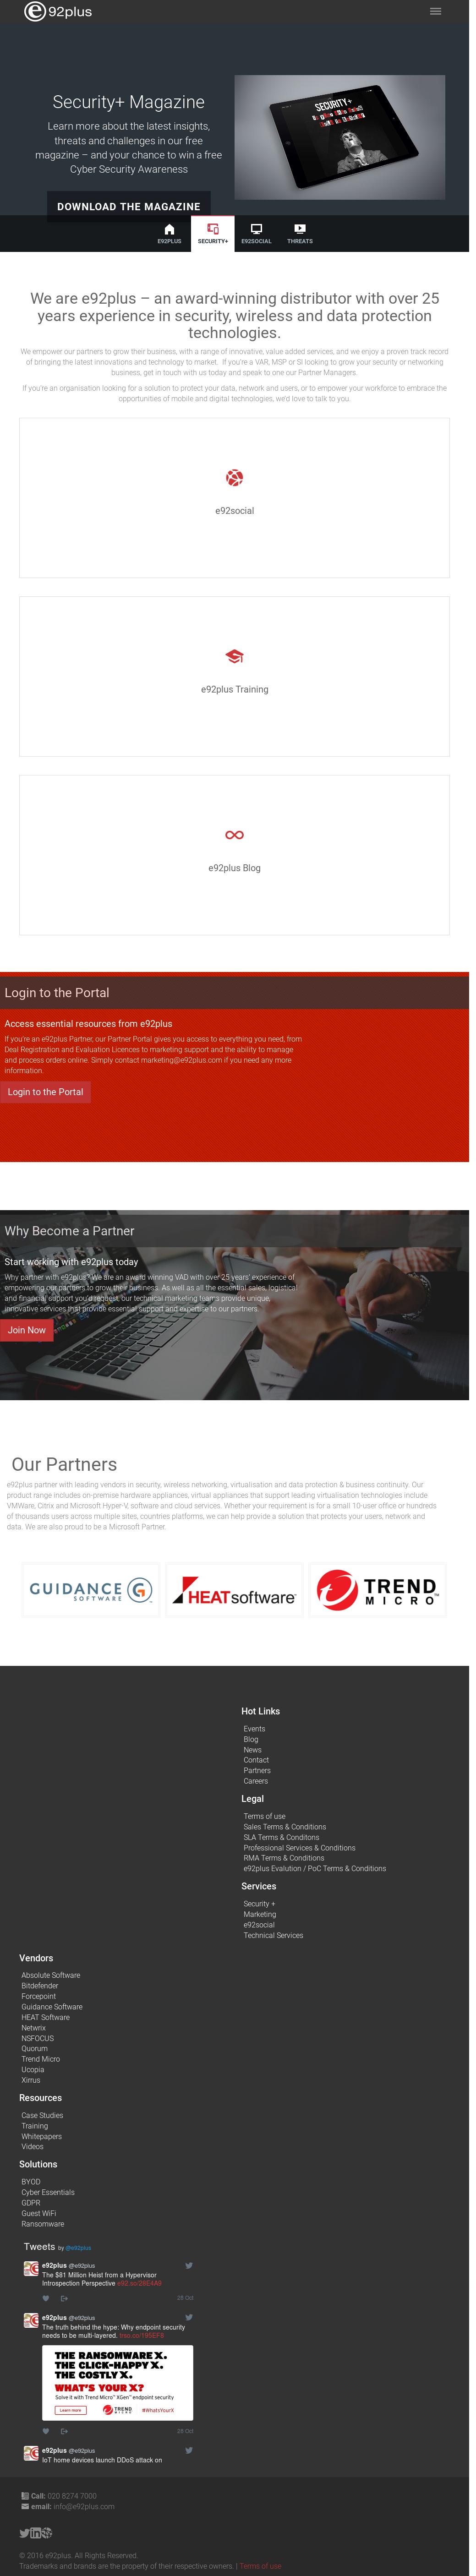 e92plus Competitors, Revenue and Employees - Owler Company